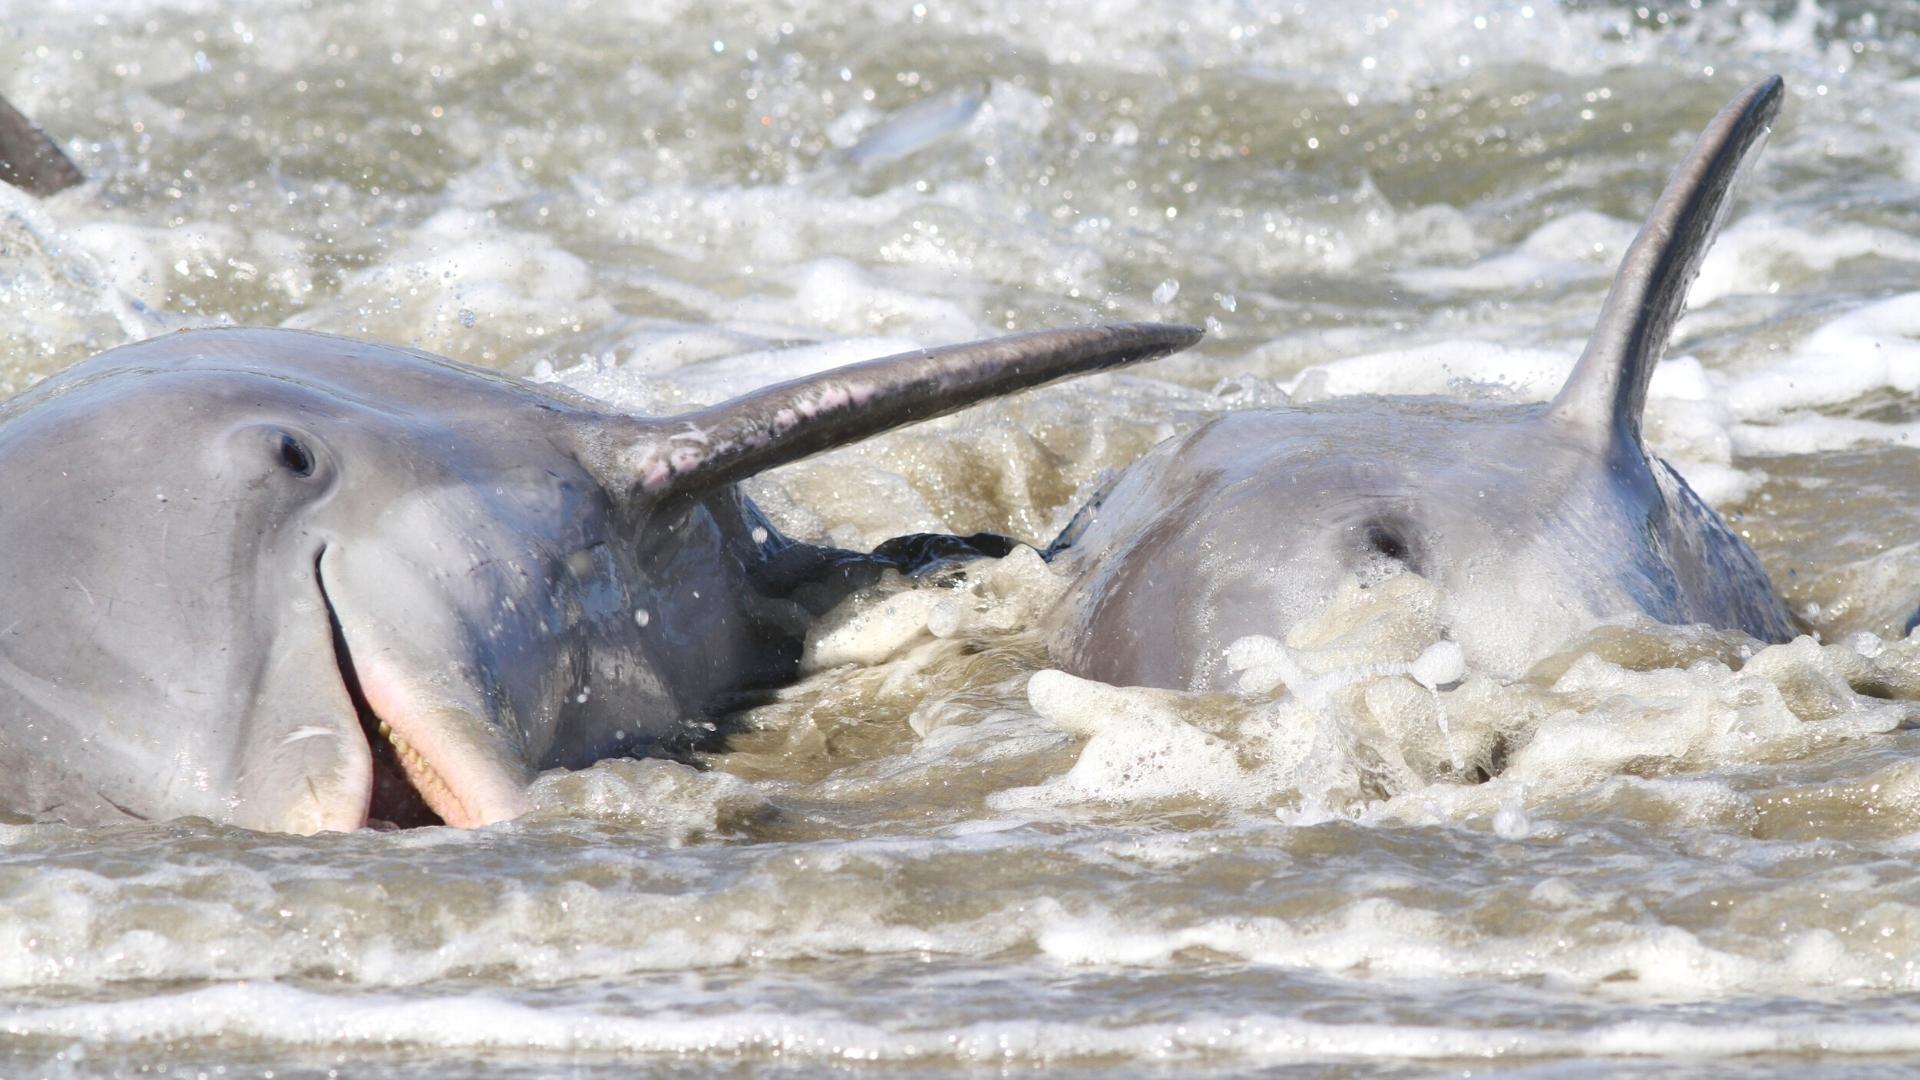 Dolphins Strand Feeding on Kiawah Island at Captain Sams Inlet